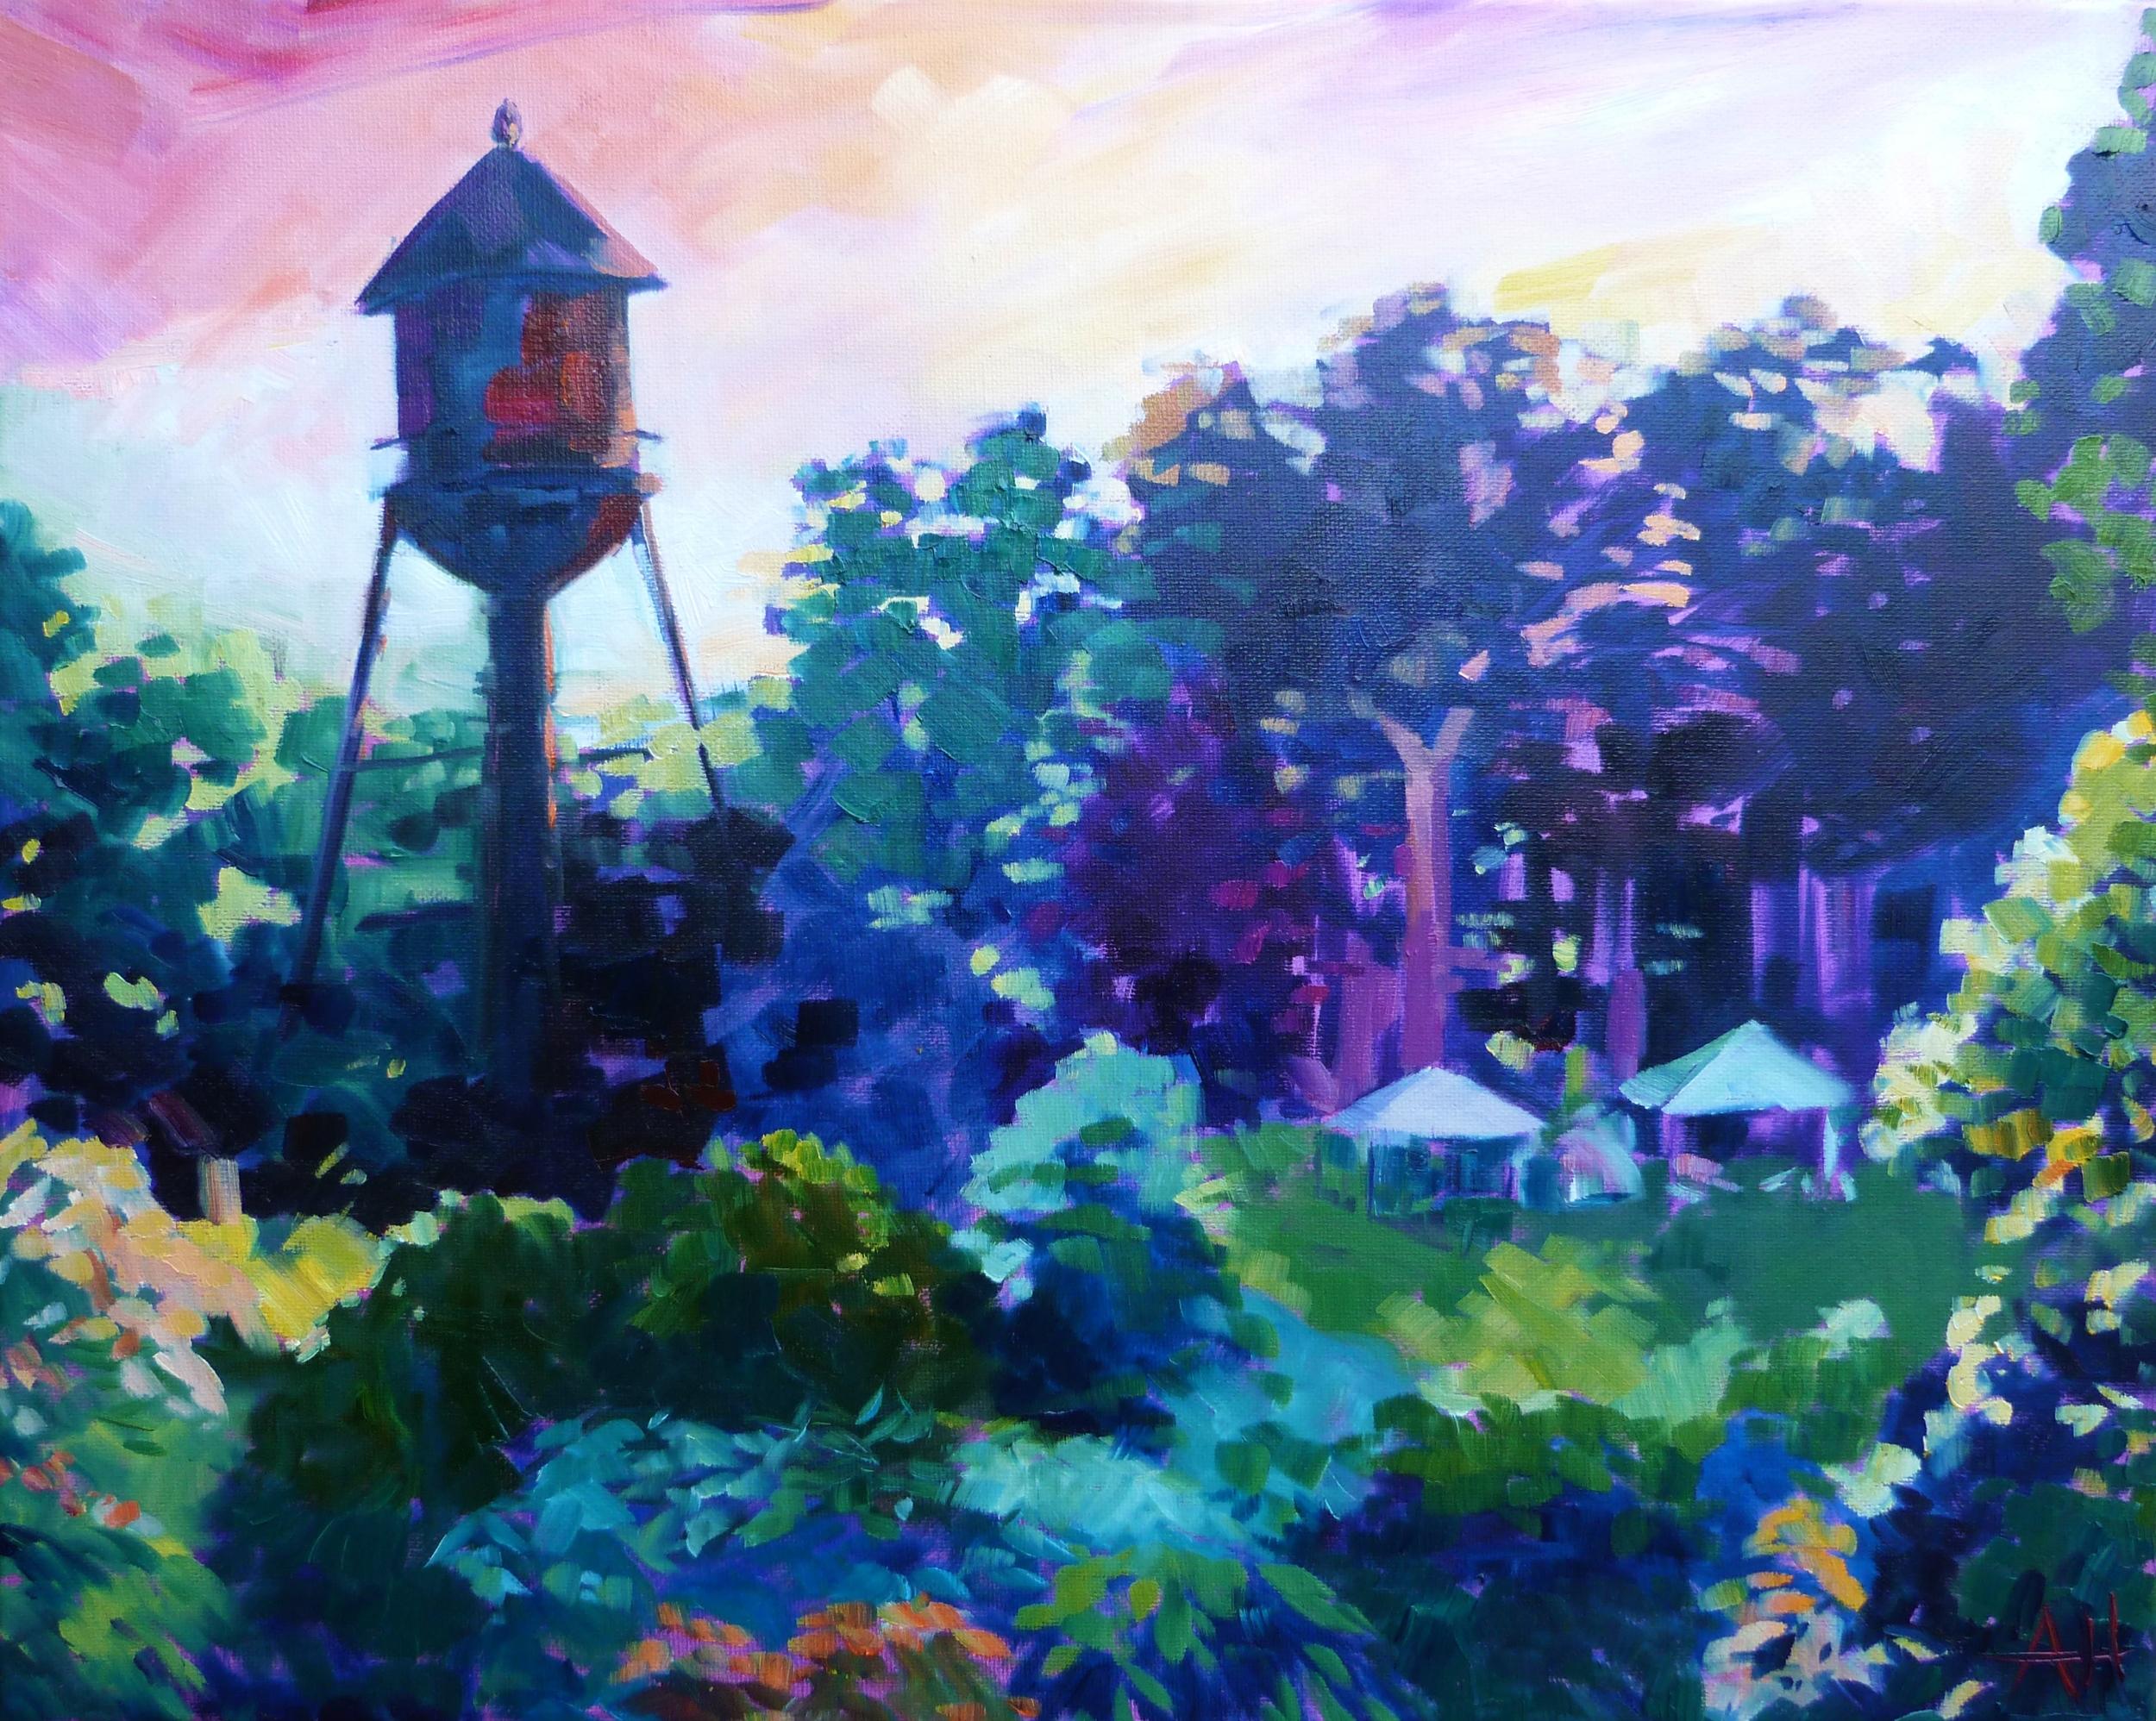 "SOLD, Clifftop Music Festival Water Tower, Copyright 2014 Hirschten, Oil on Canvas 16"" x 20"""